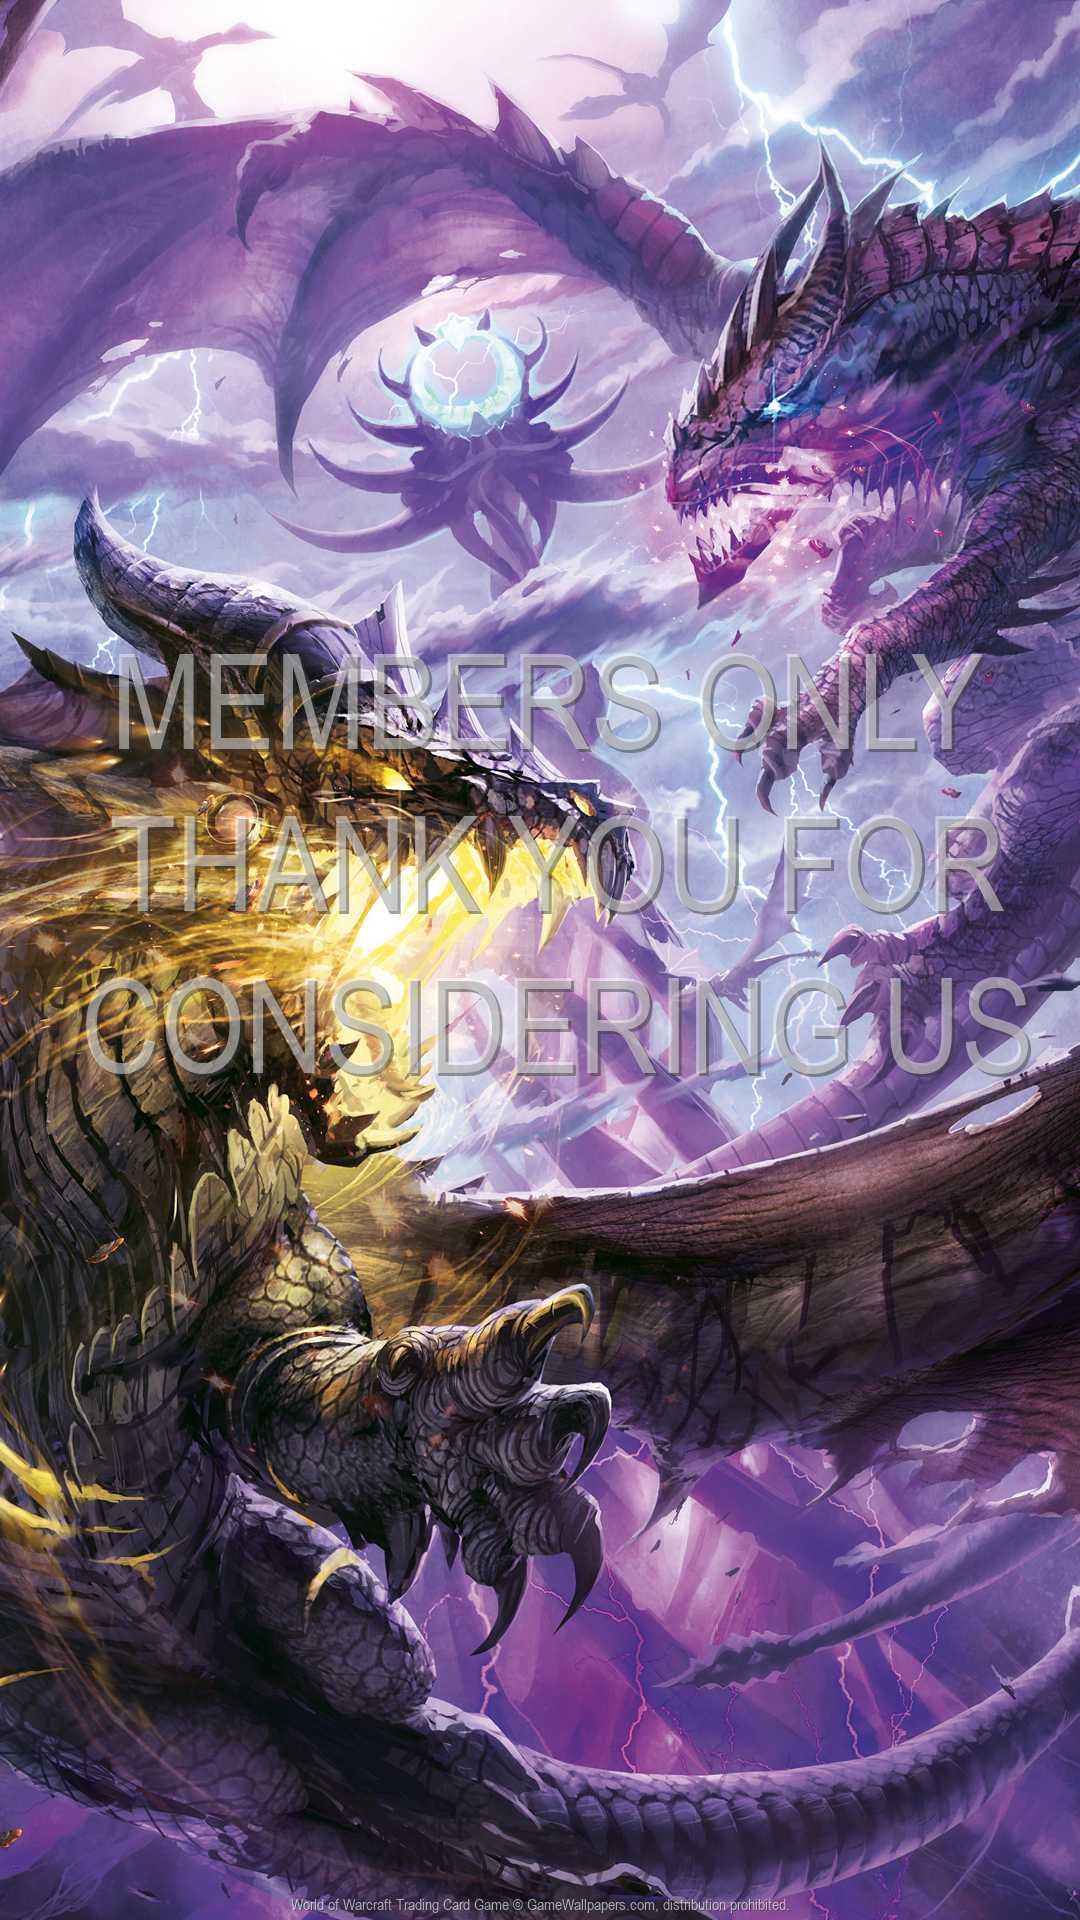 World of Warcraft: Trading Card Game 1080p Vertical Handy Hintergrundbild 56